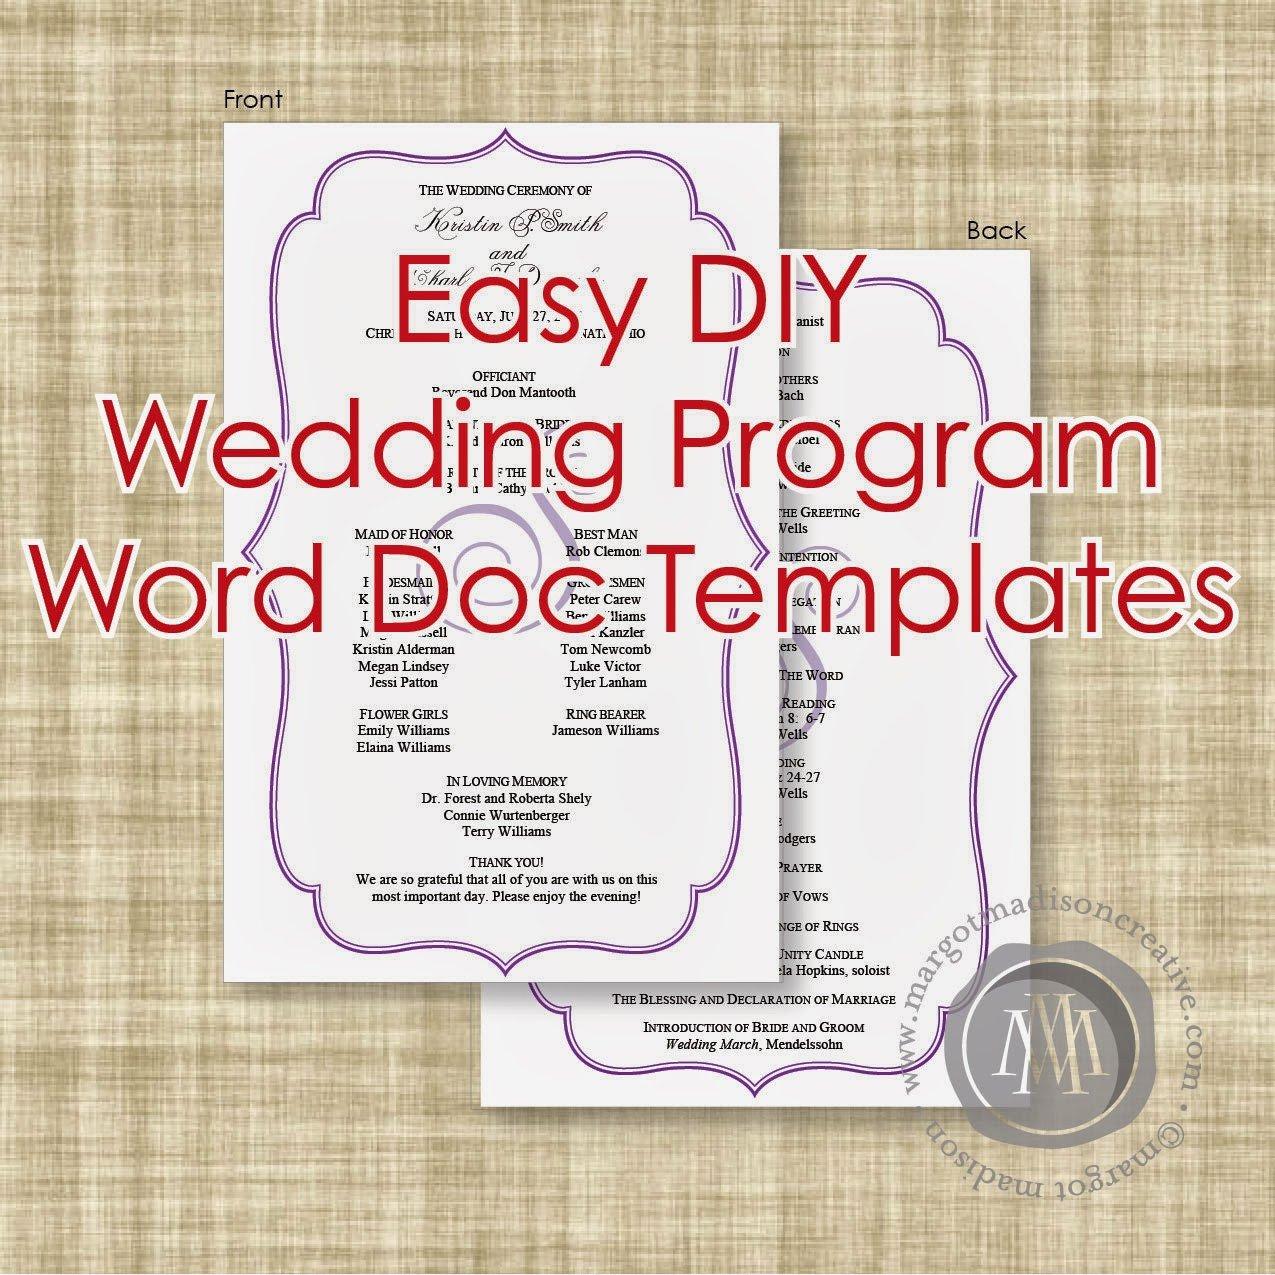 Wedding Programs Free Templates Margotmadison Diy Wedding Program Word Doc Templates now